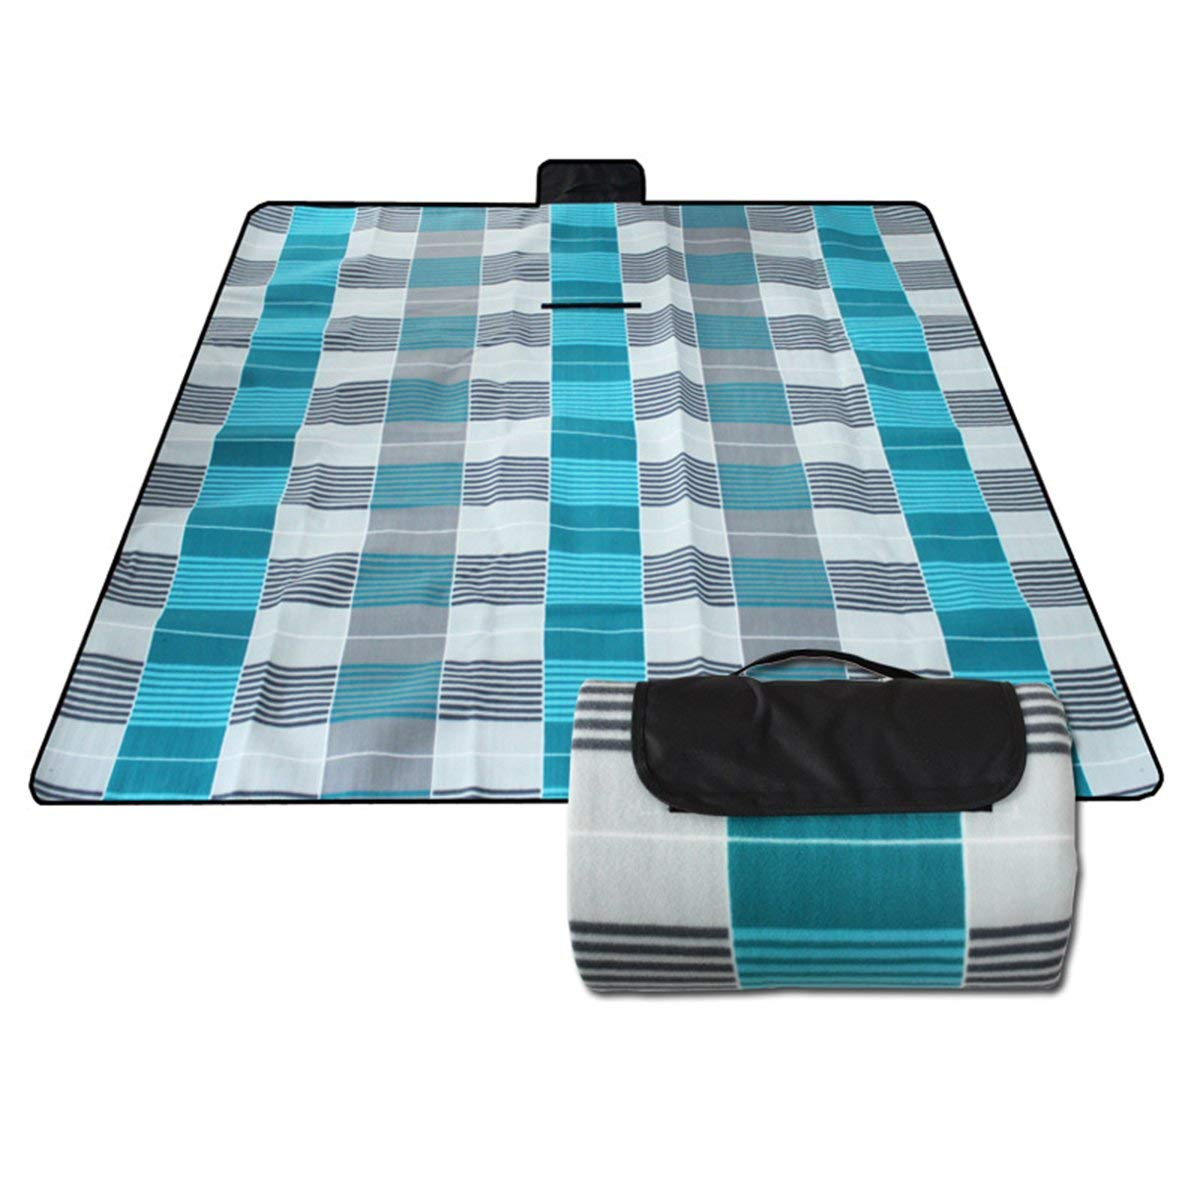 2d0c1e2e78e7 Cheap Foldable Beach Blanket, find Foldable Beach Blanket deals on ...